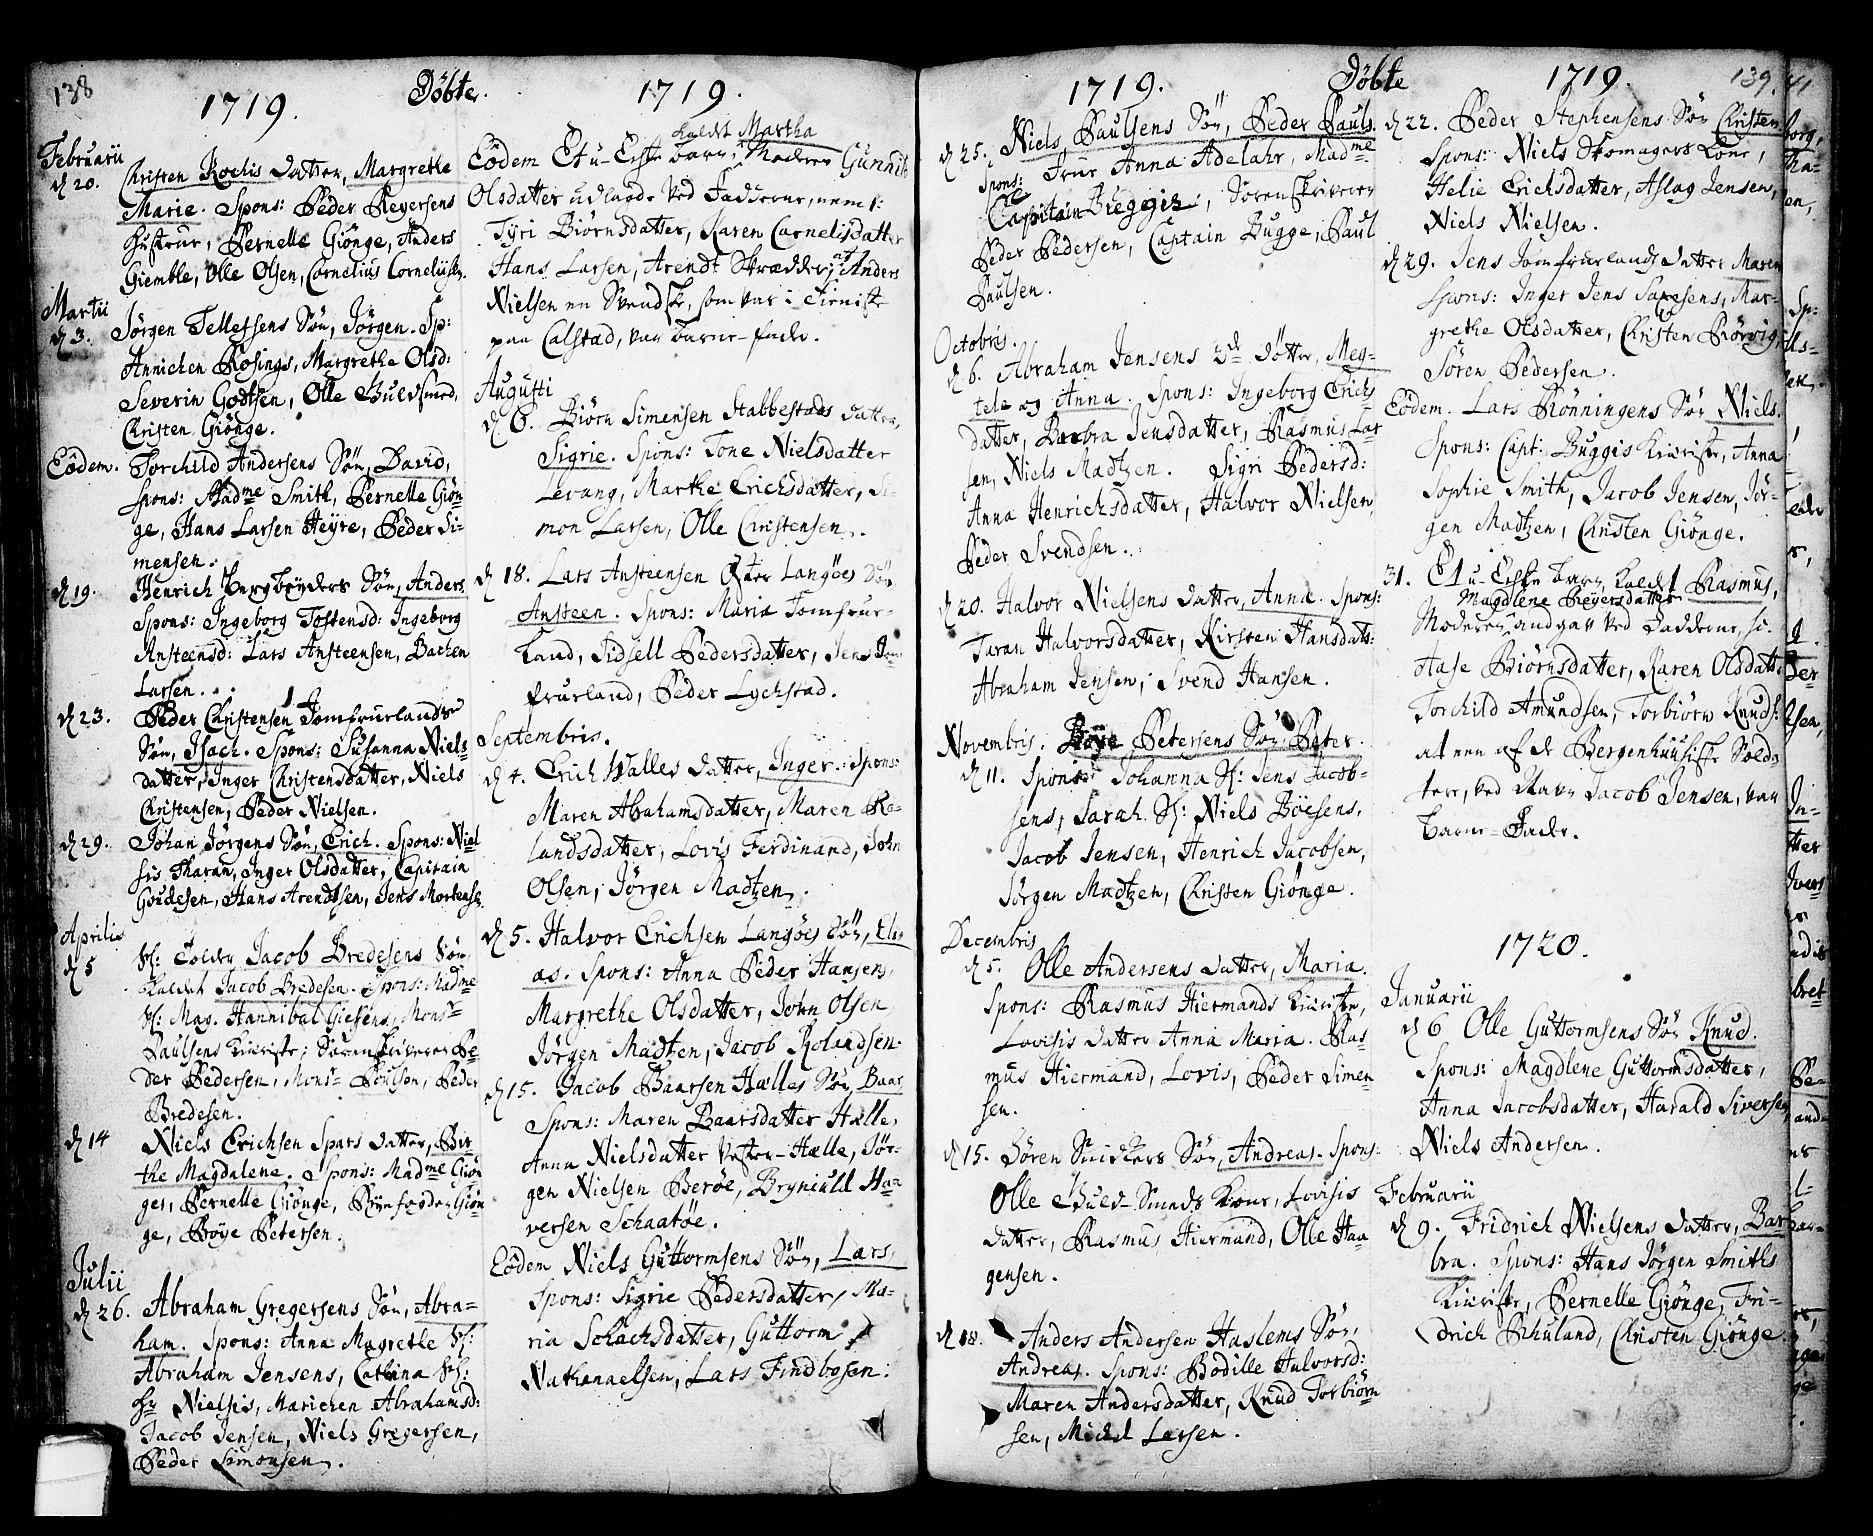 SAKO, Kragerø kirkebøker, F/Fa/L0001: Ministerialbok nr. 1, 1702-1766, s. 138-139